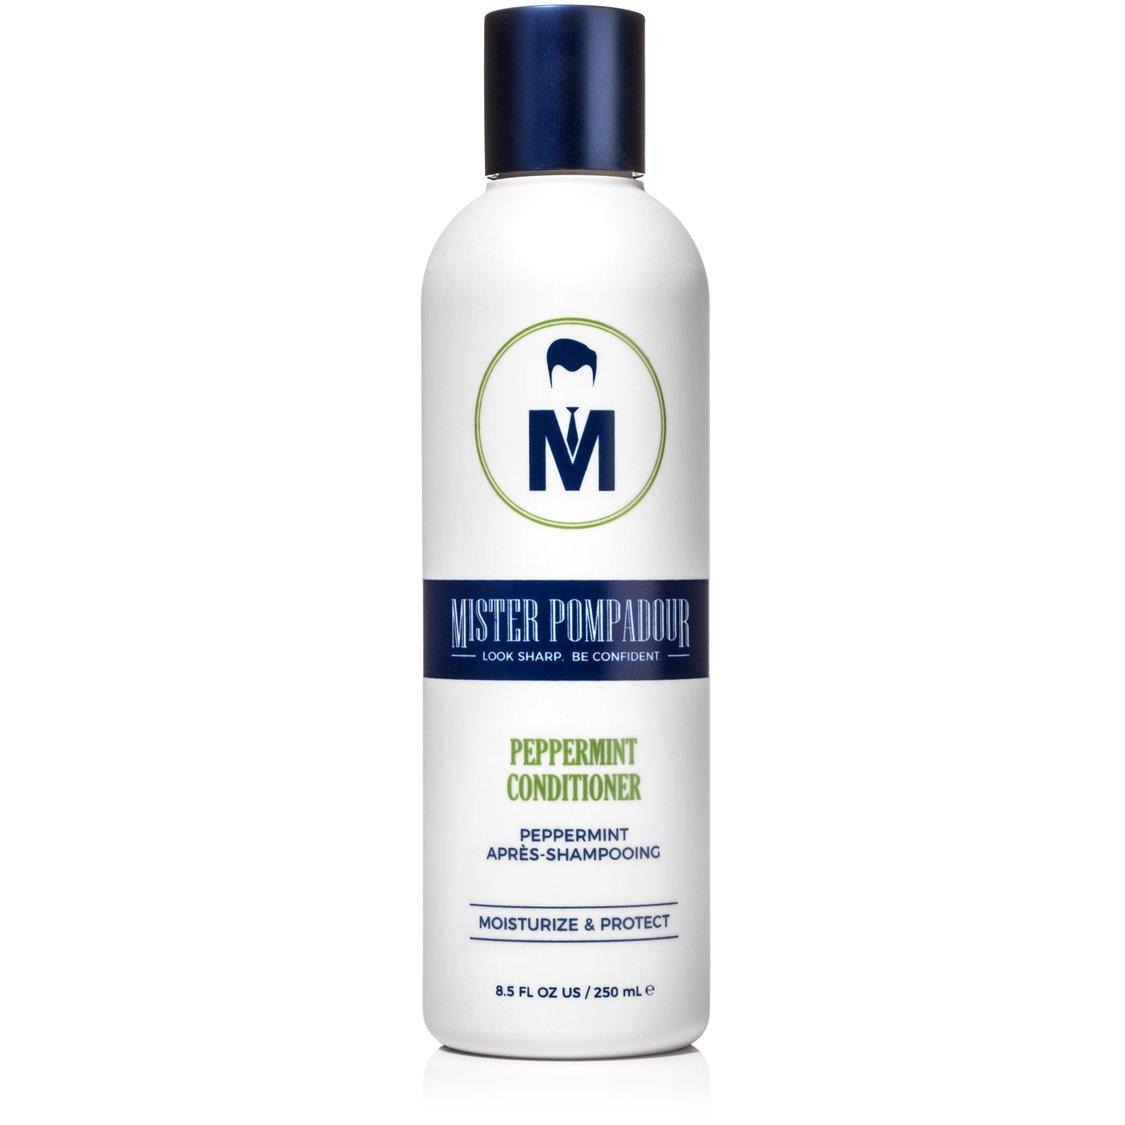 Mister Pompadour Peppermint Conditioner - 8.5 oz - Look Sharp. Be Confident